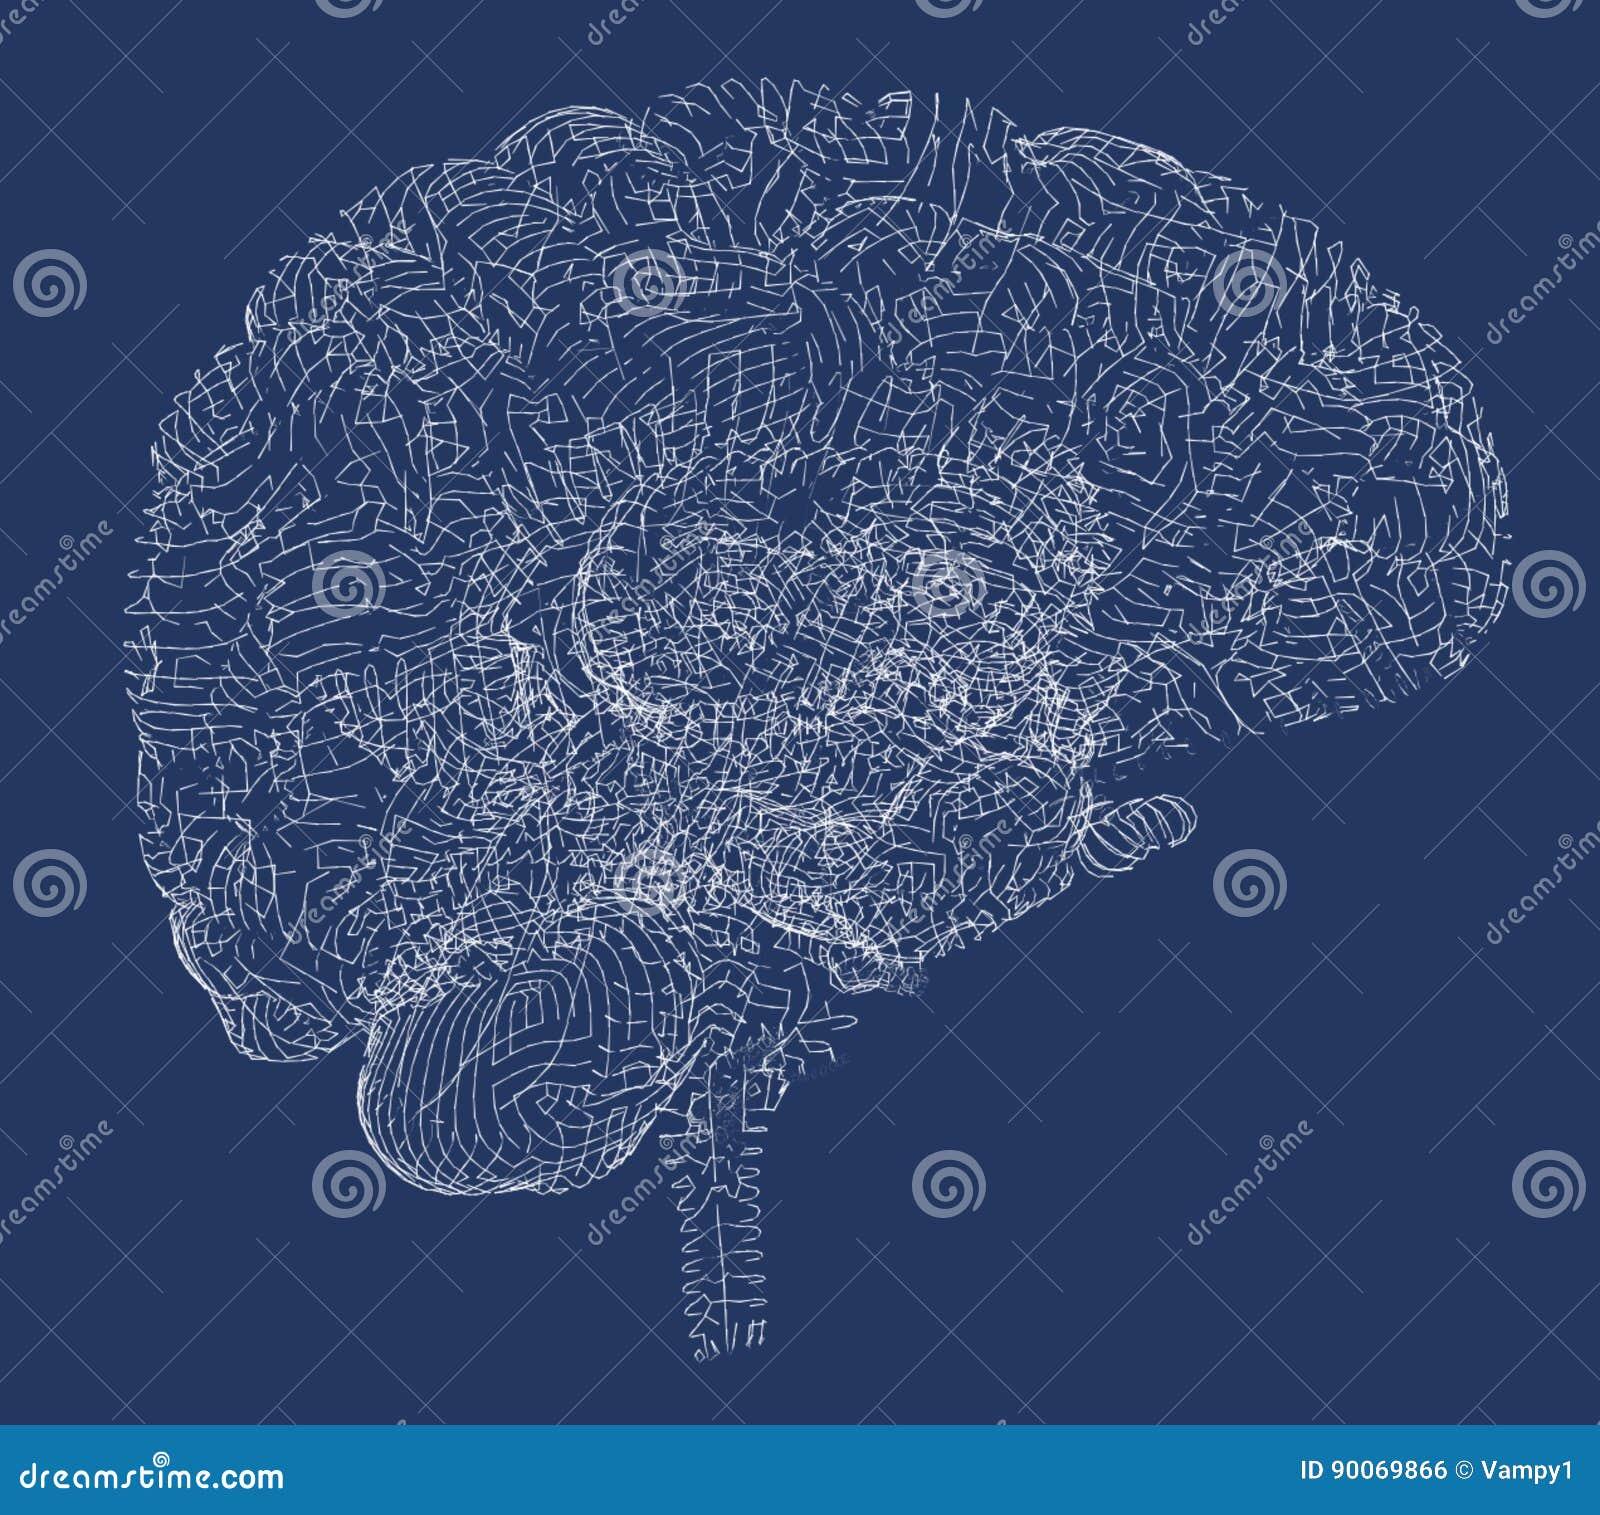 Malattie degeneranti del cervello, Parkinson, sinapsi, neuroni,